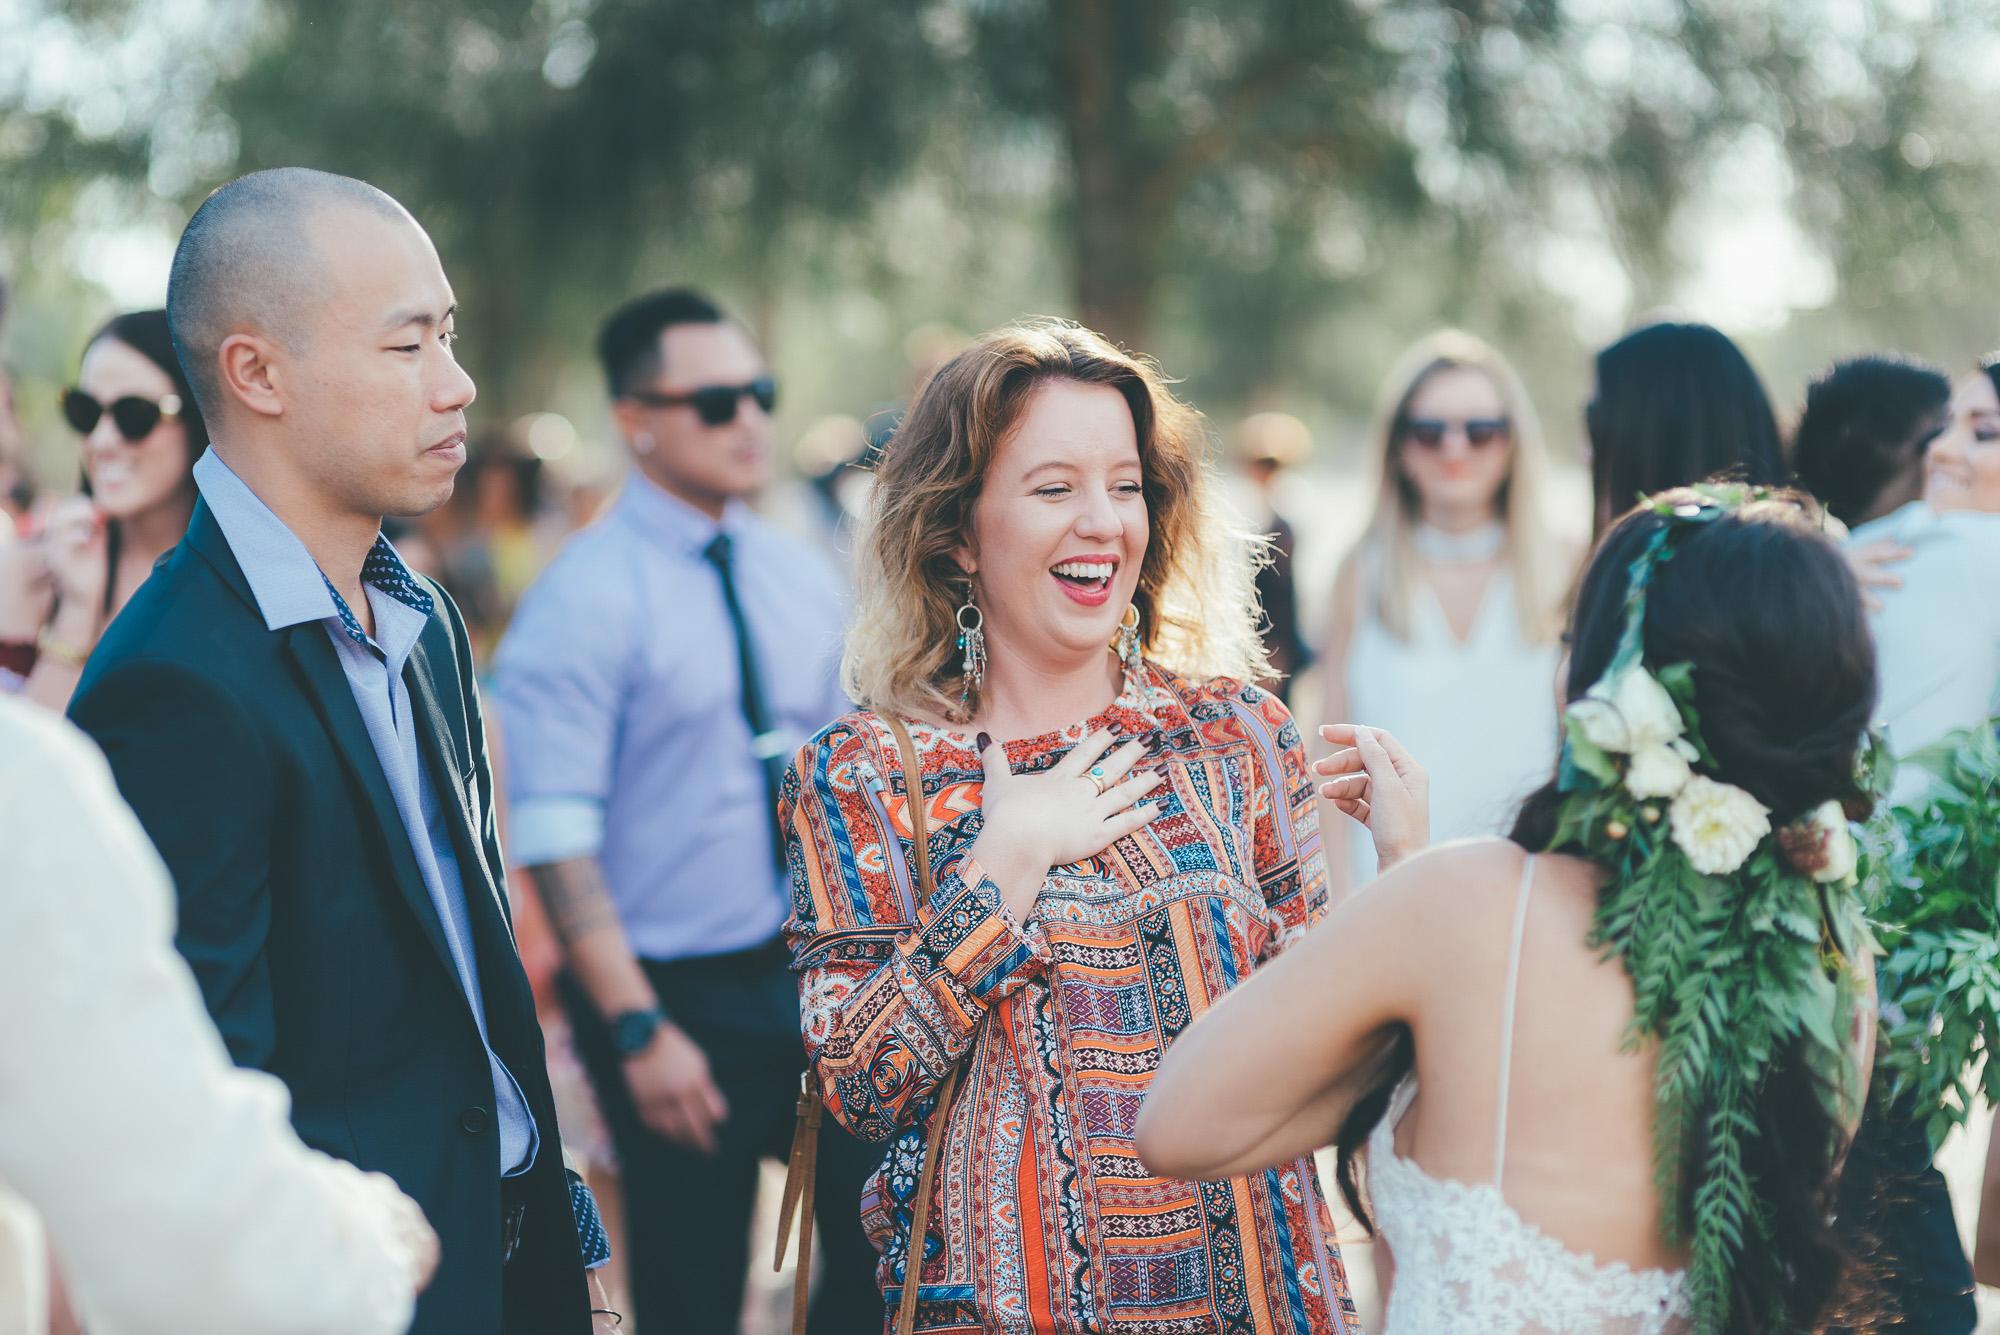 wedding-photographer-outdoor-casual-styled-los-angeles-australia-california-international-earthbound -51.jpg